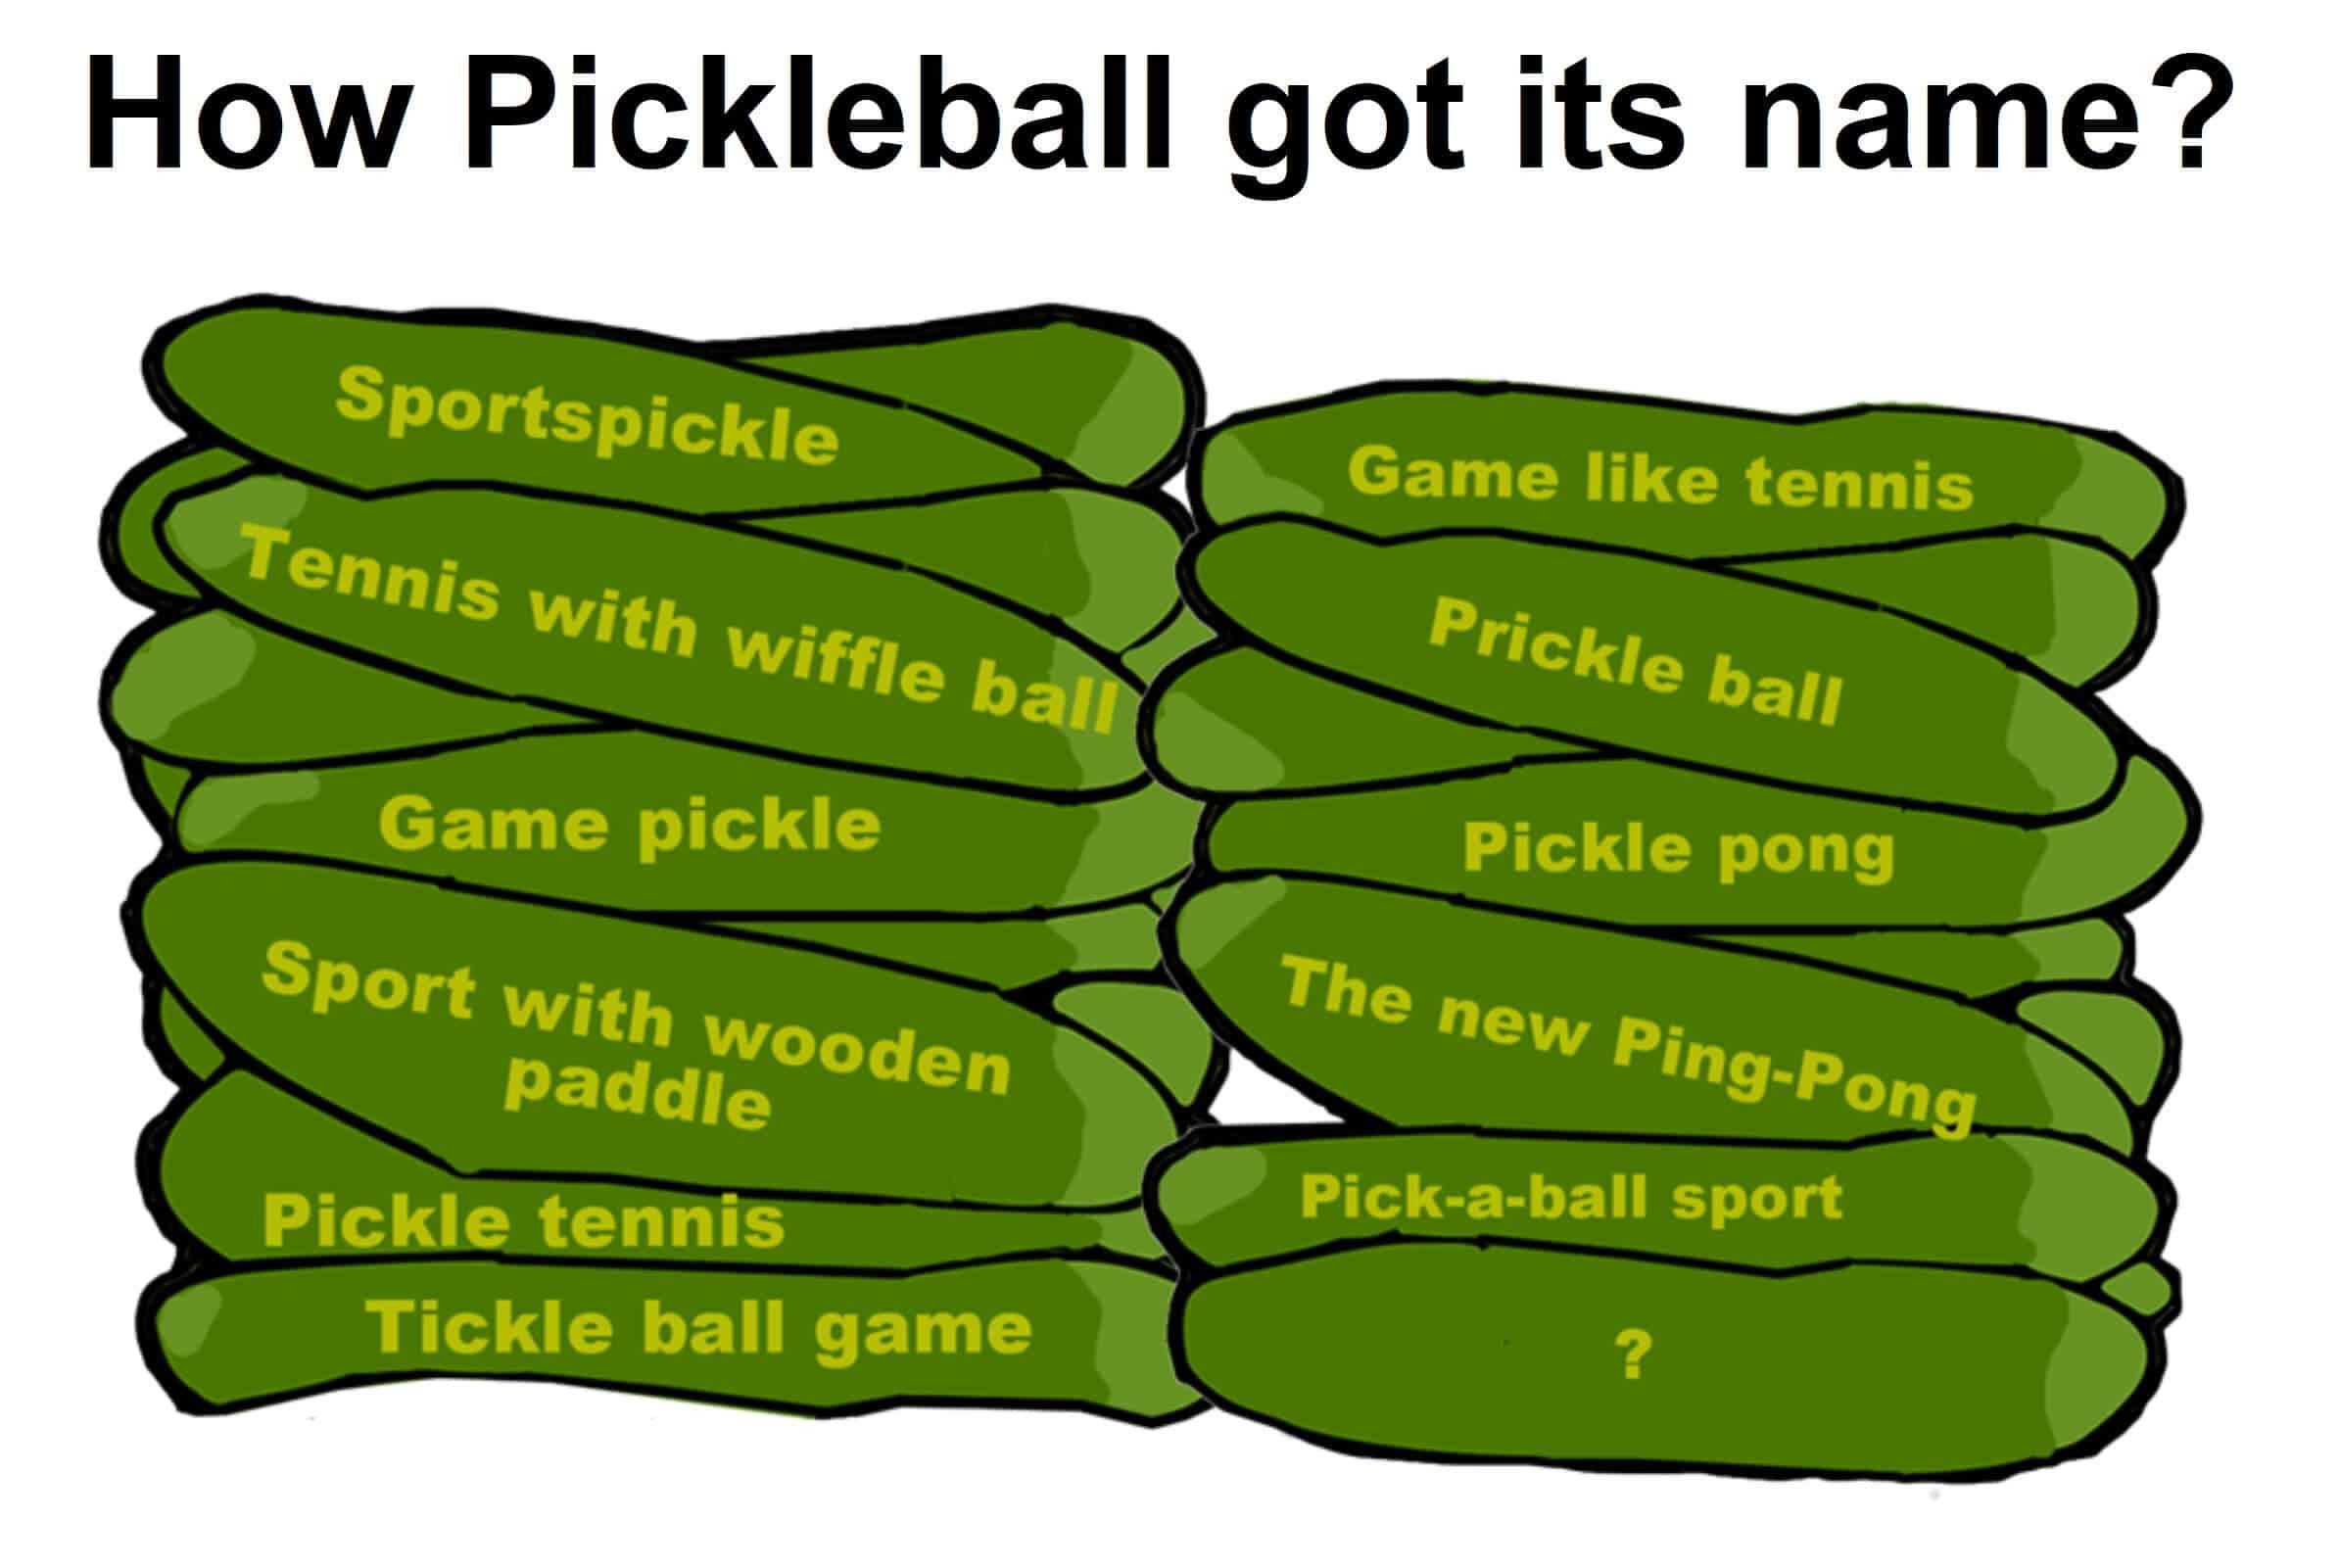 How pickleball game got its name